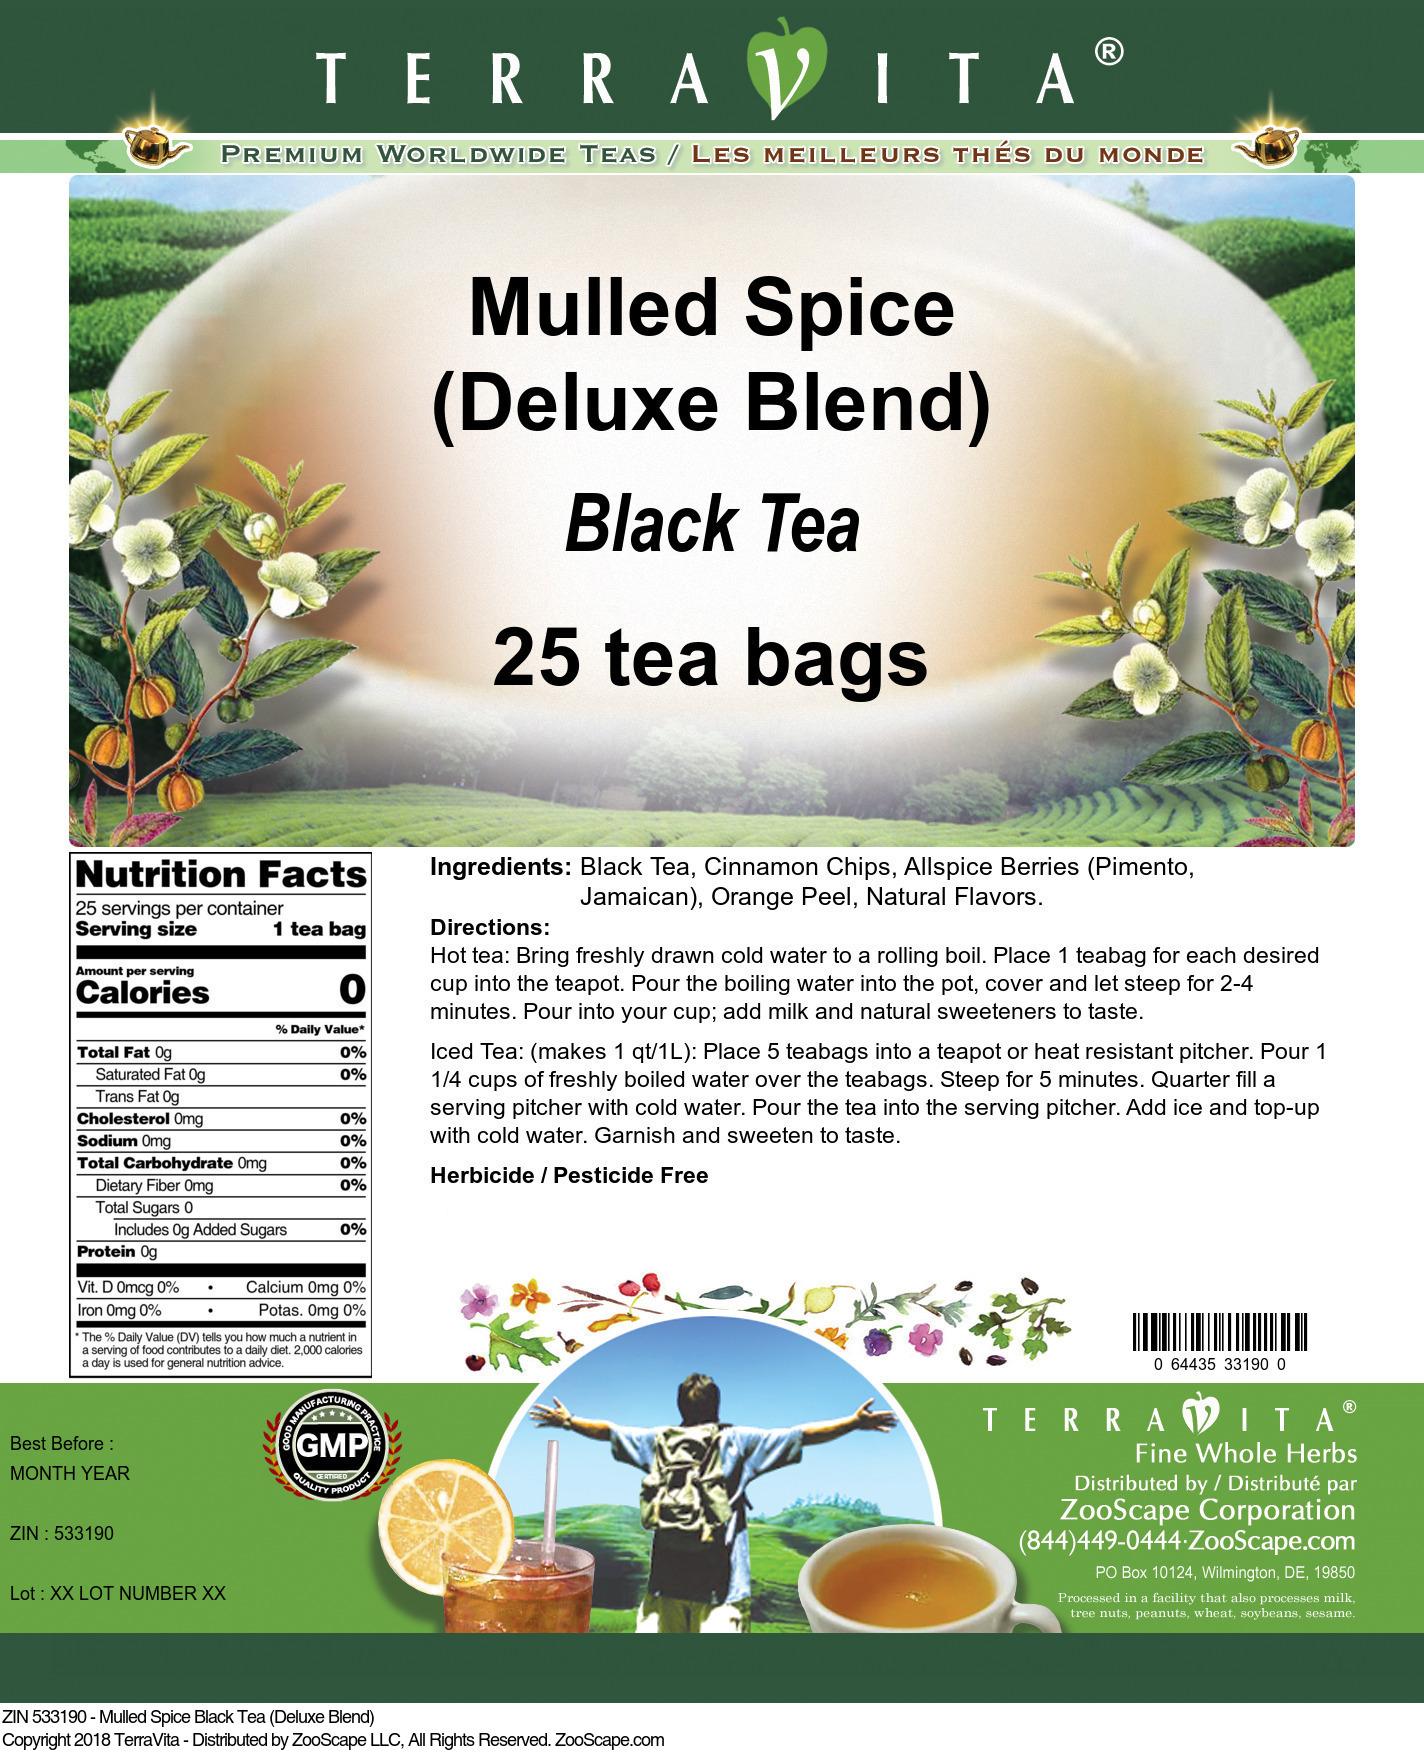 Mulled Spice Black Tea (Deluxe Blend)